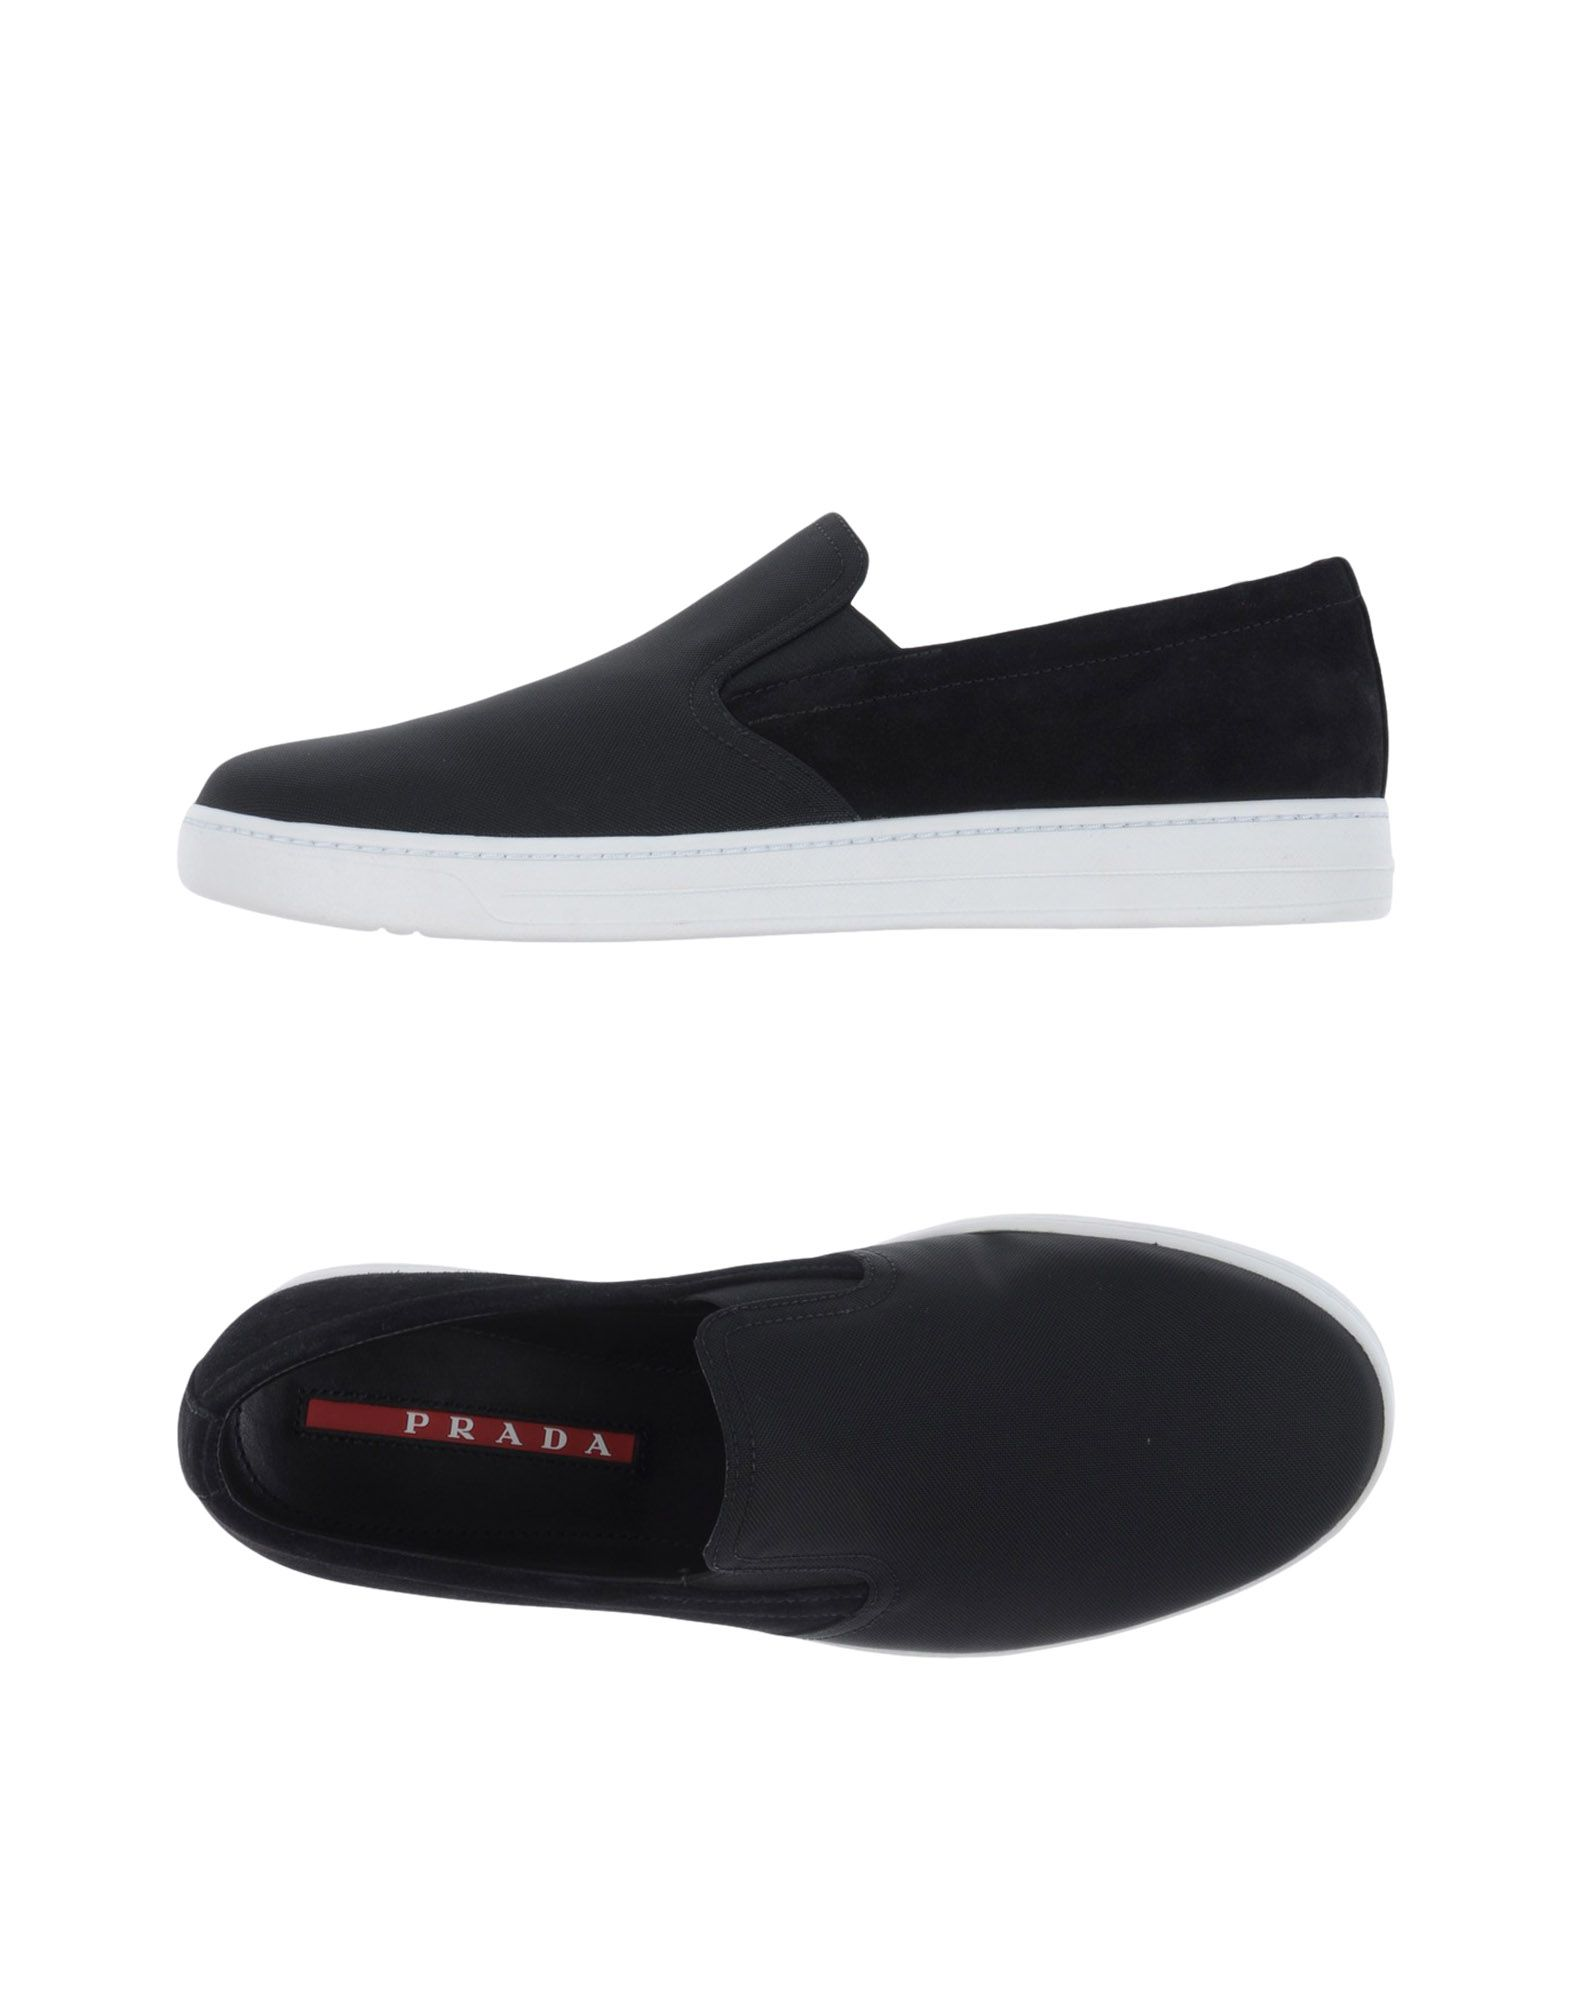 Prada Sport Sneakers - Men Prada  Sport Sneakers online on  Prada Australia - 11174187KF cfd055